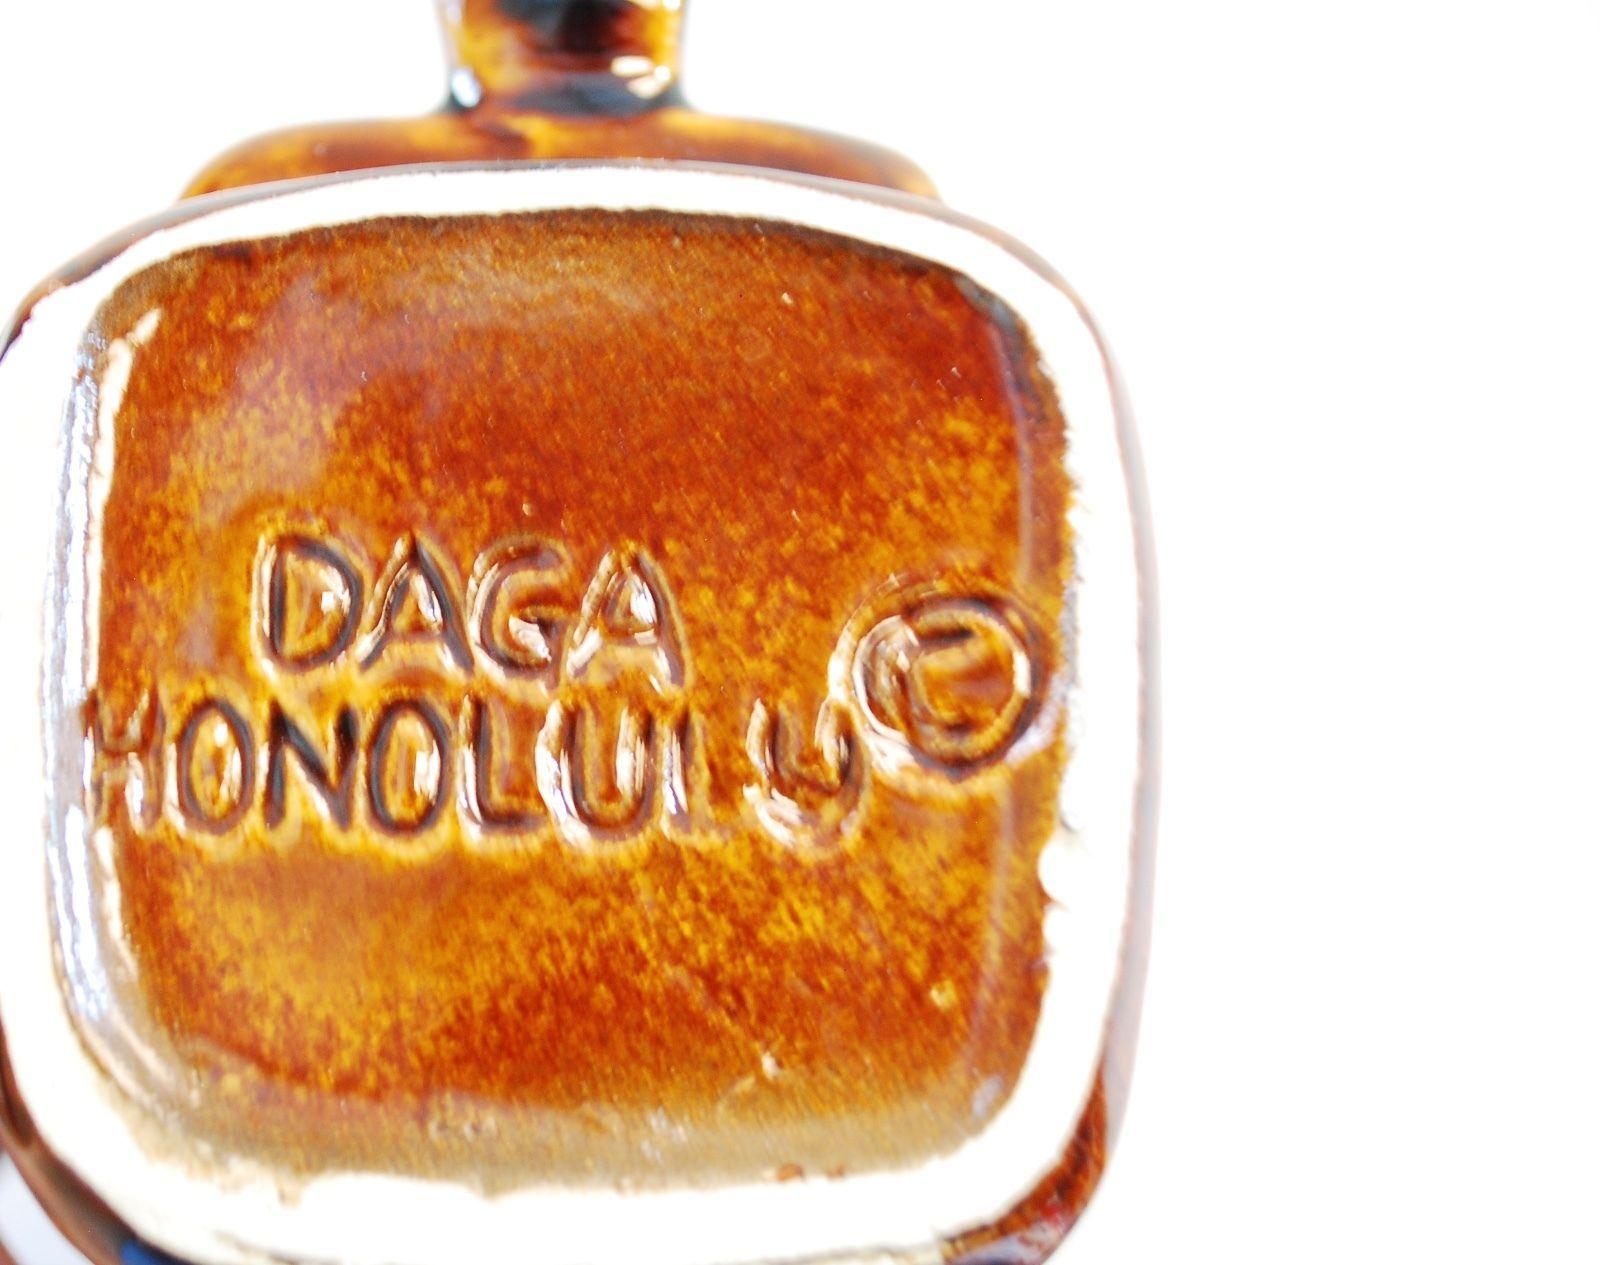 "VINTAGE GOLF BAG TIKI MUG BY DAGA HONOLULU HAWAII - BROWN GLAZE - 5 3/4"" TALL"